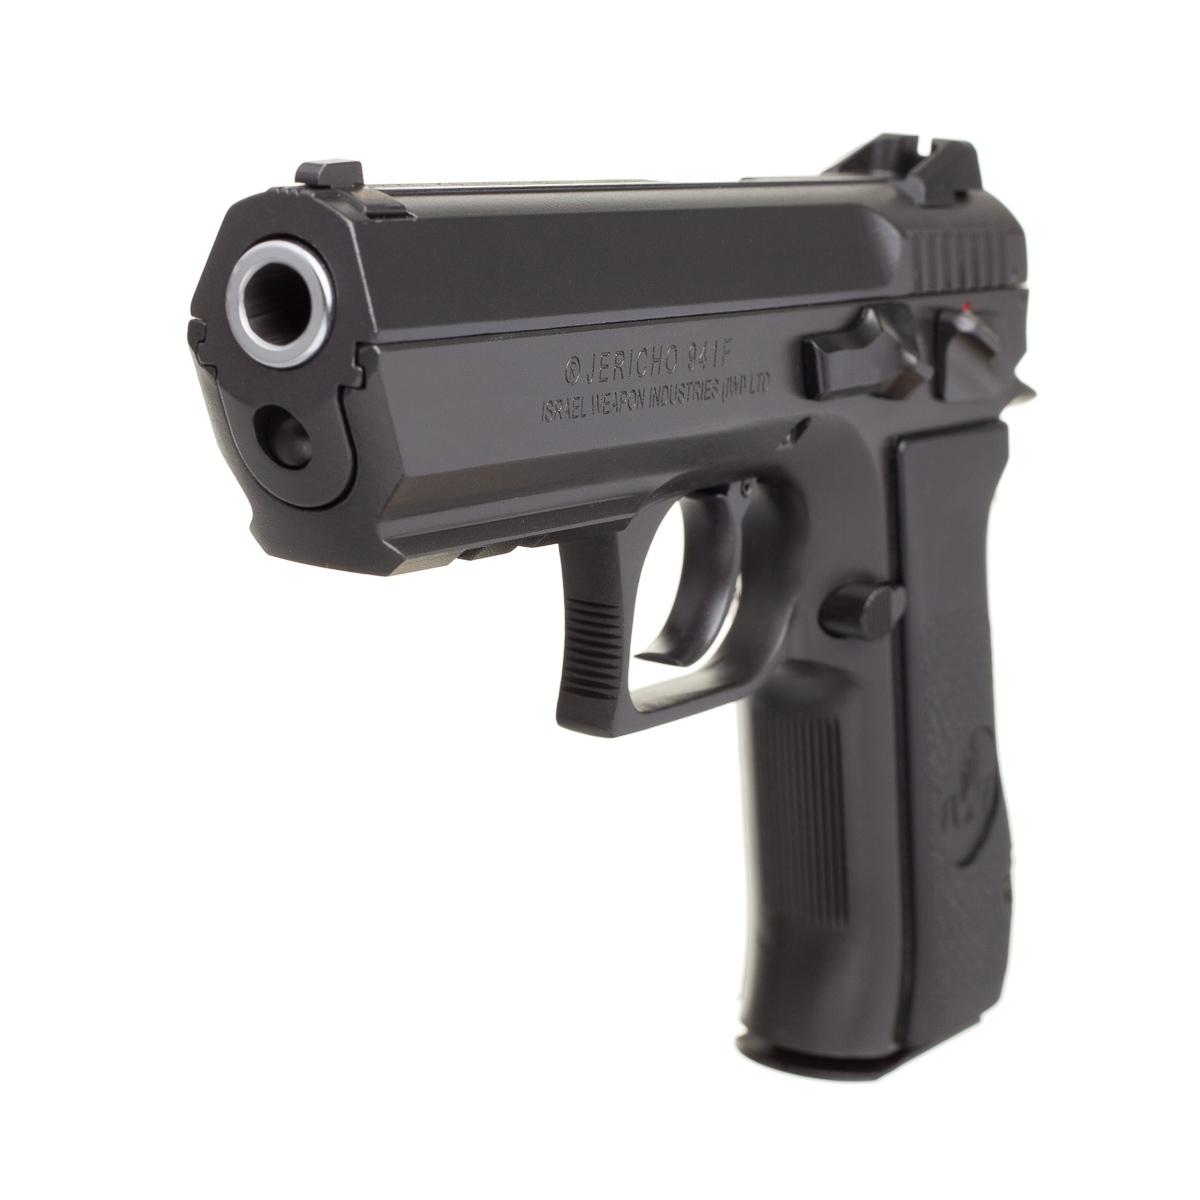 Pistola IWI Jericho 941 F Metal 9mm